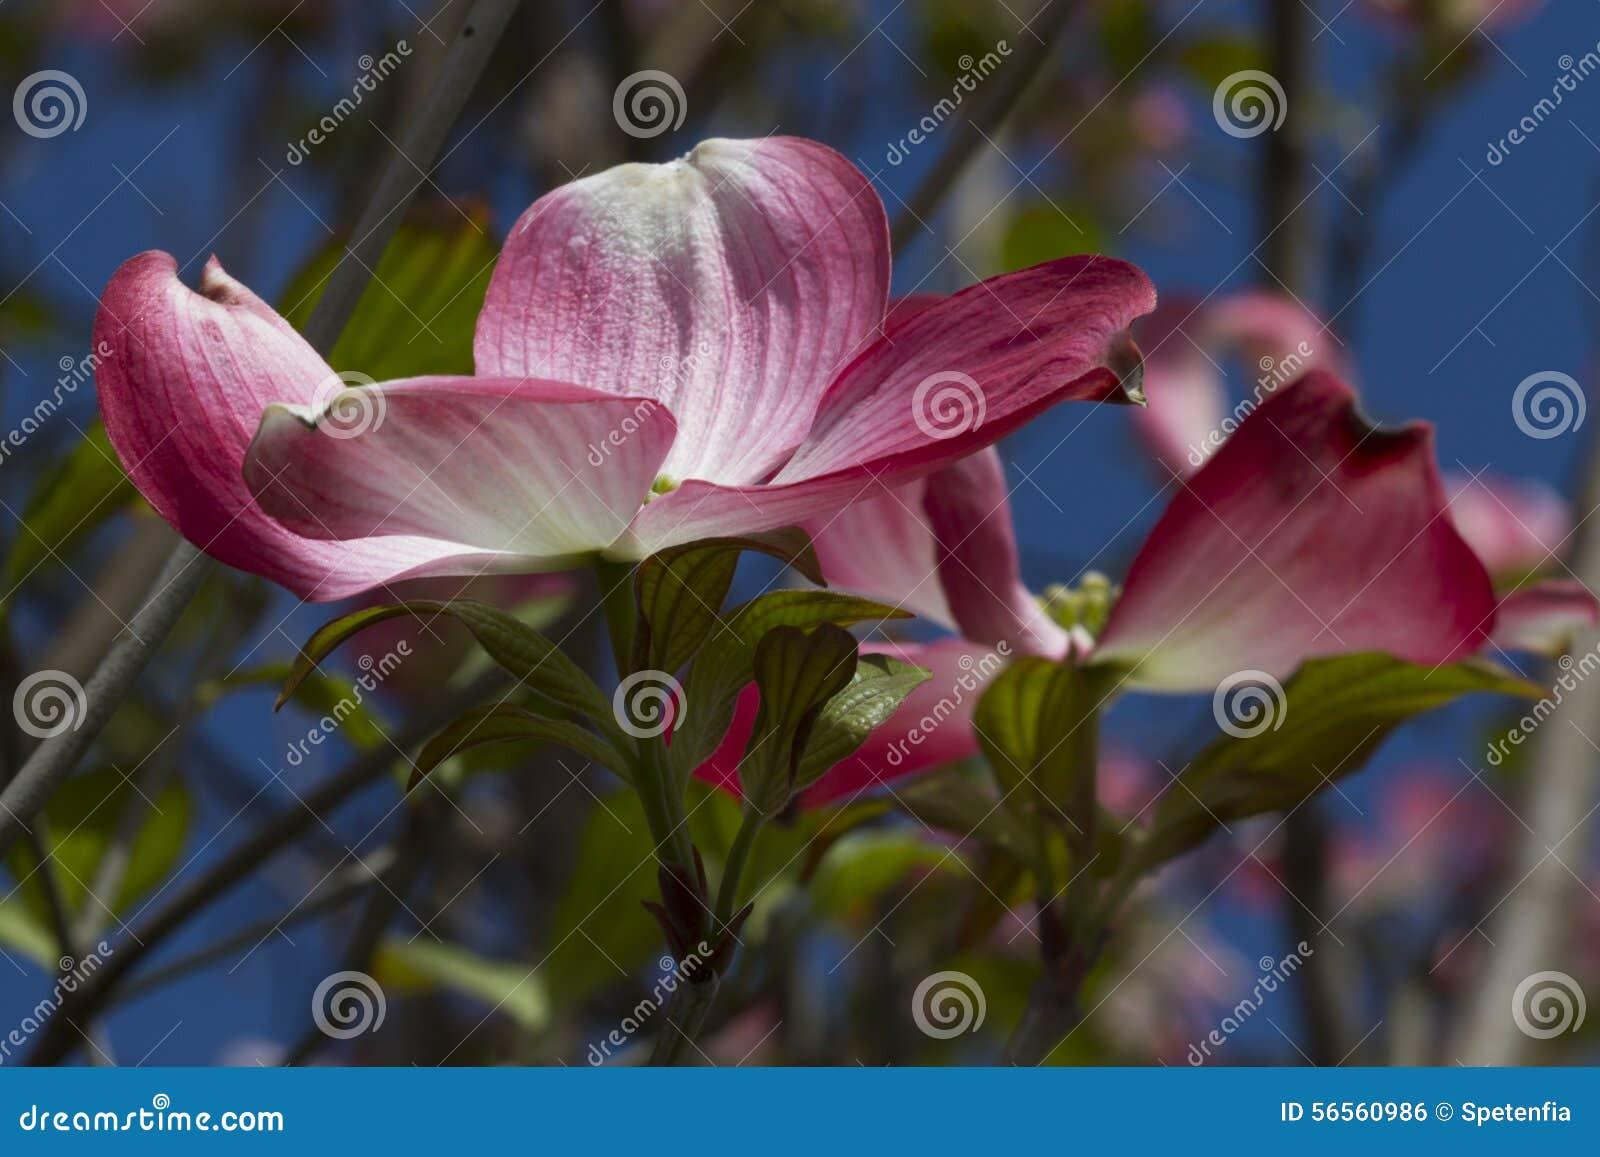 Download Λουλούδι Magnolia στο δέντρο Στοκ Εικόνες - εικόνα από δέντρο, πέταλο: 56560986